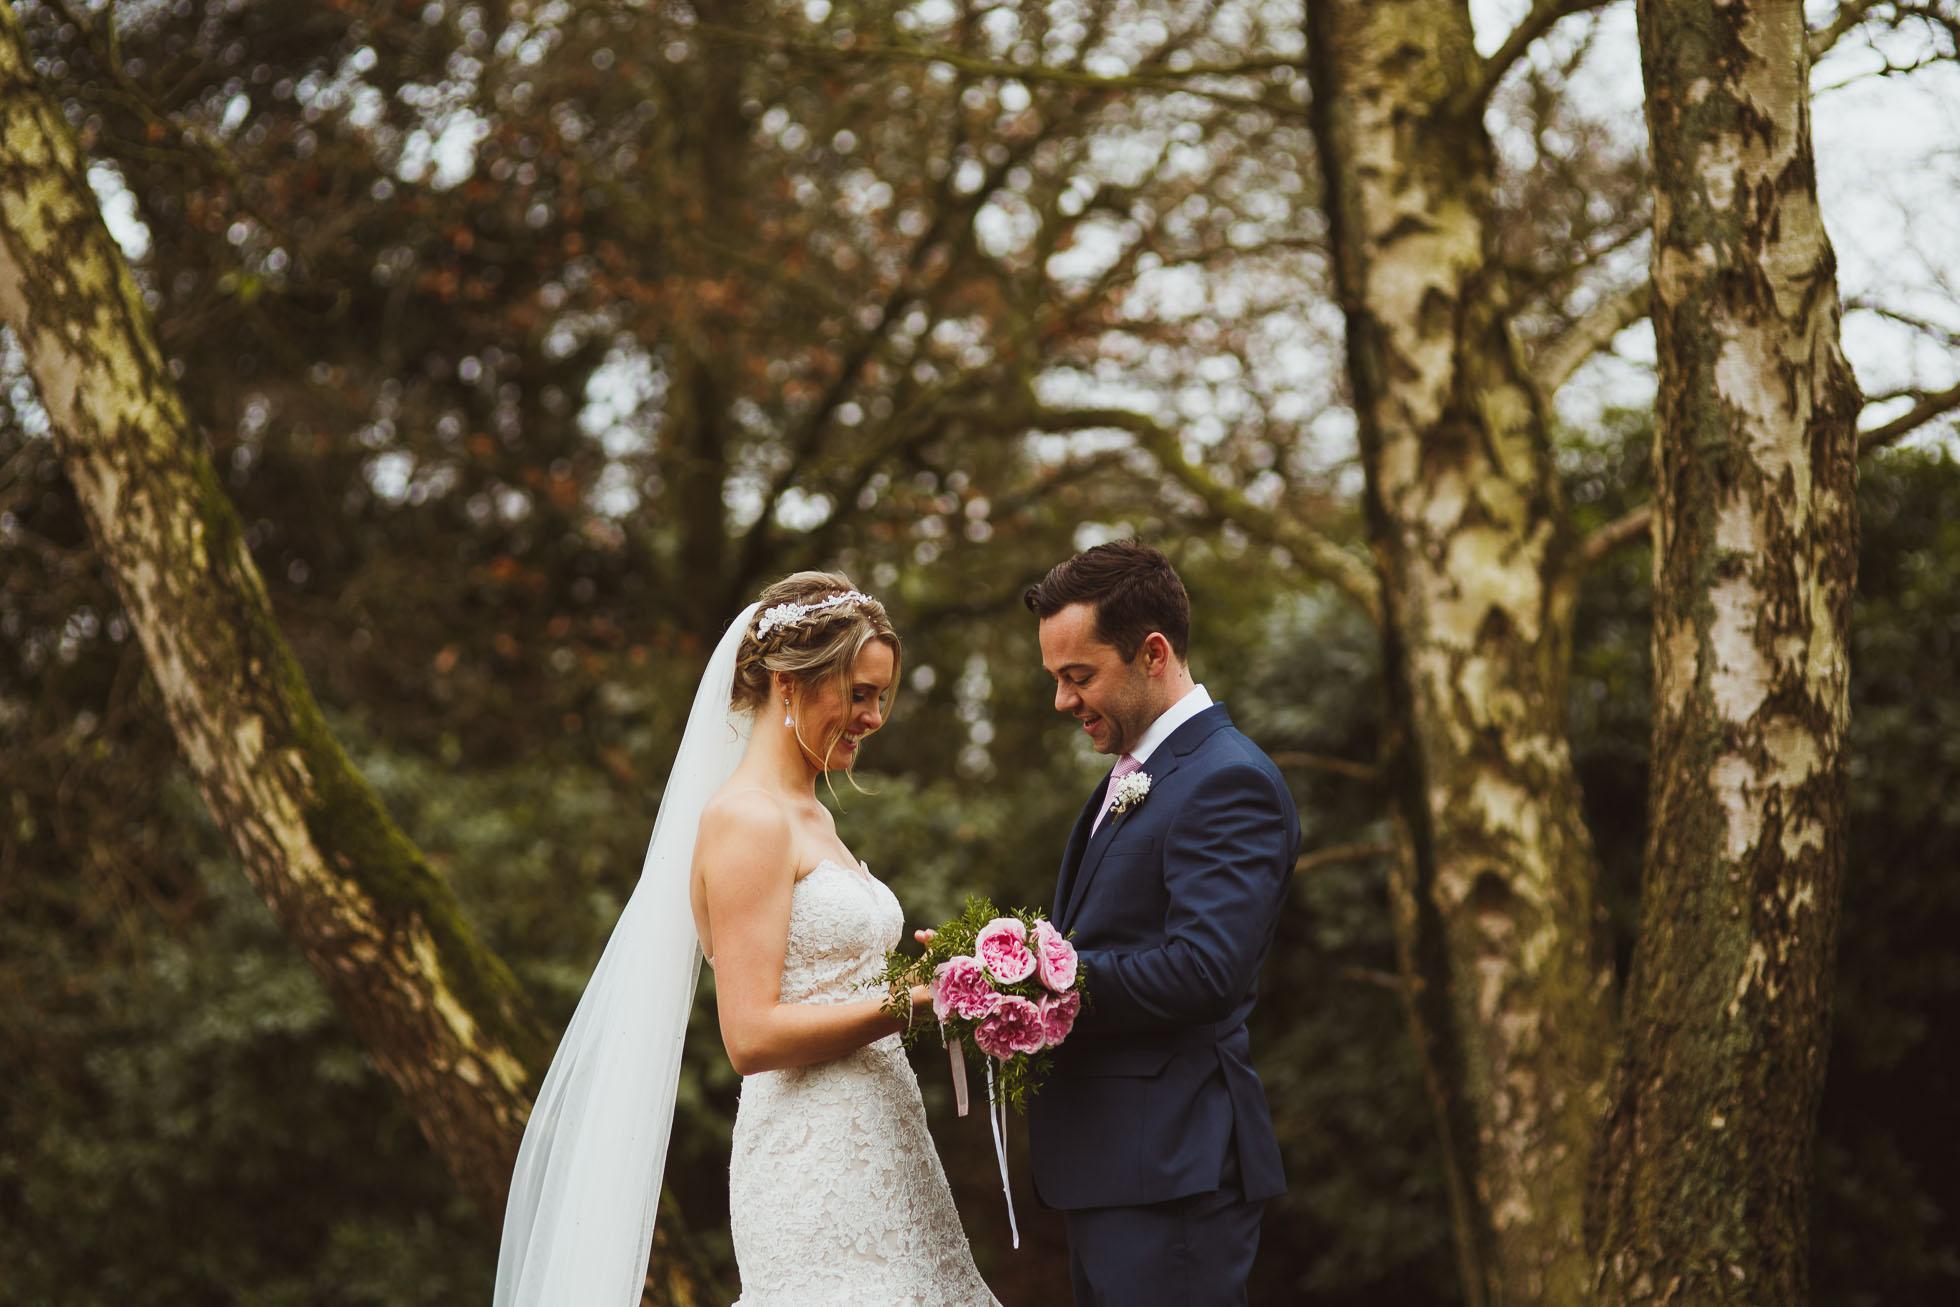 hilltop country house wedding photographer-51.jpg